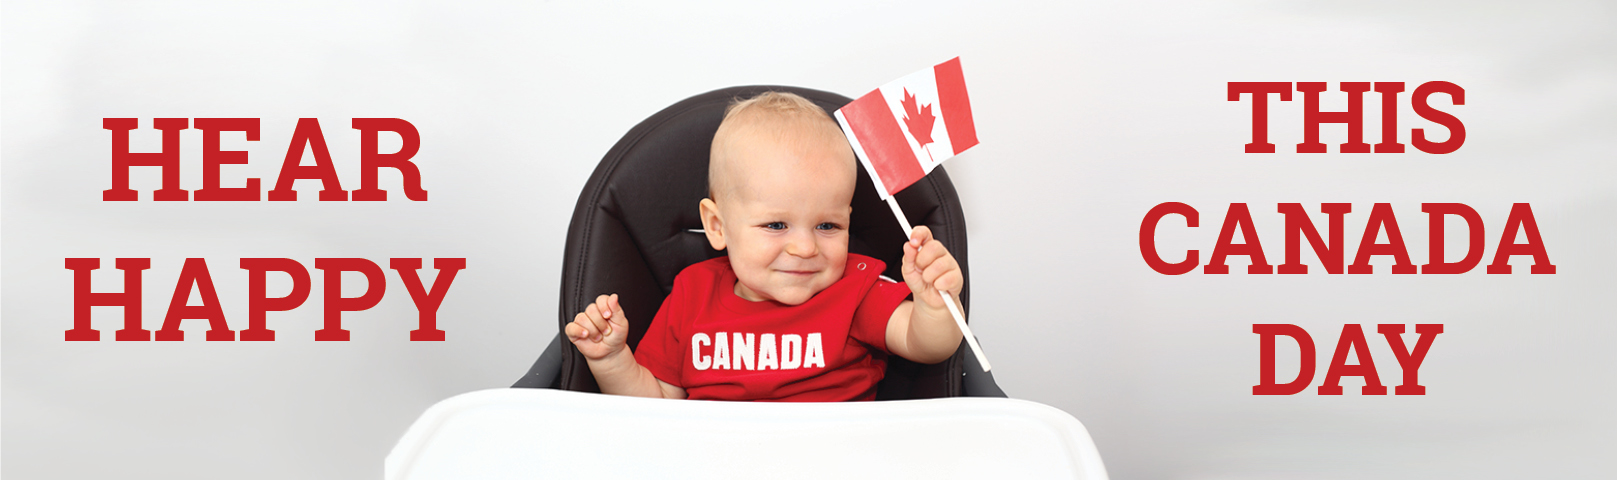 Hear Happy This Canada Day